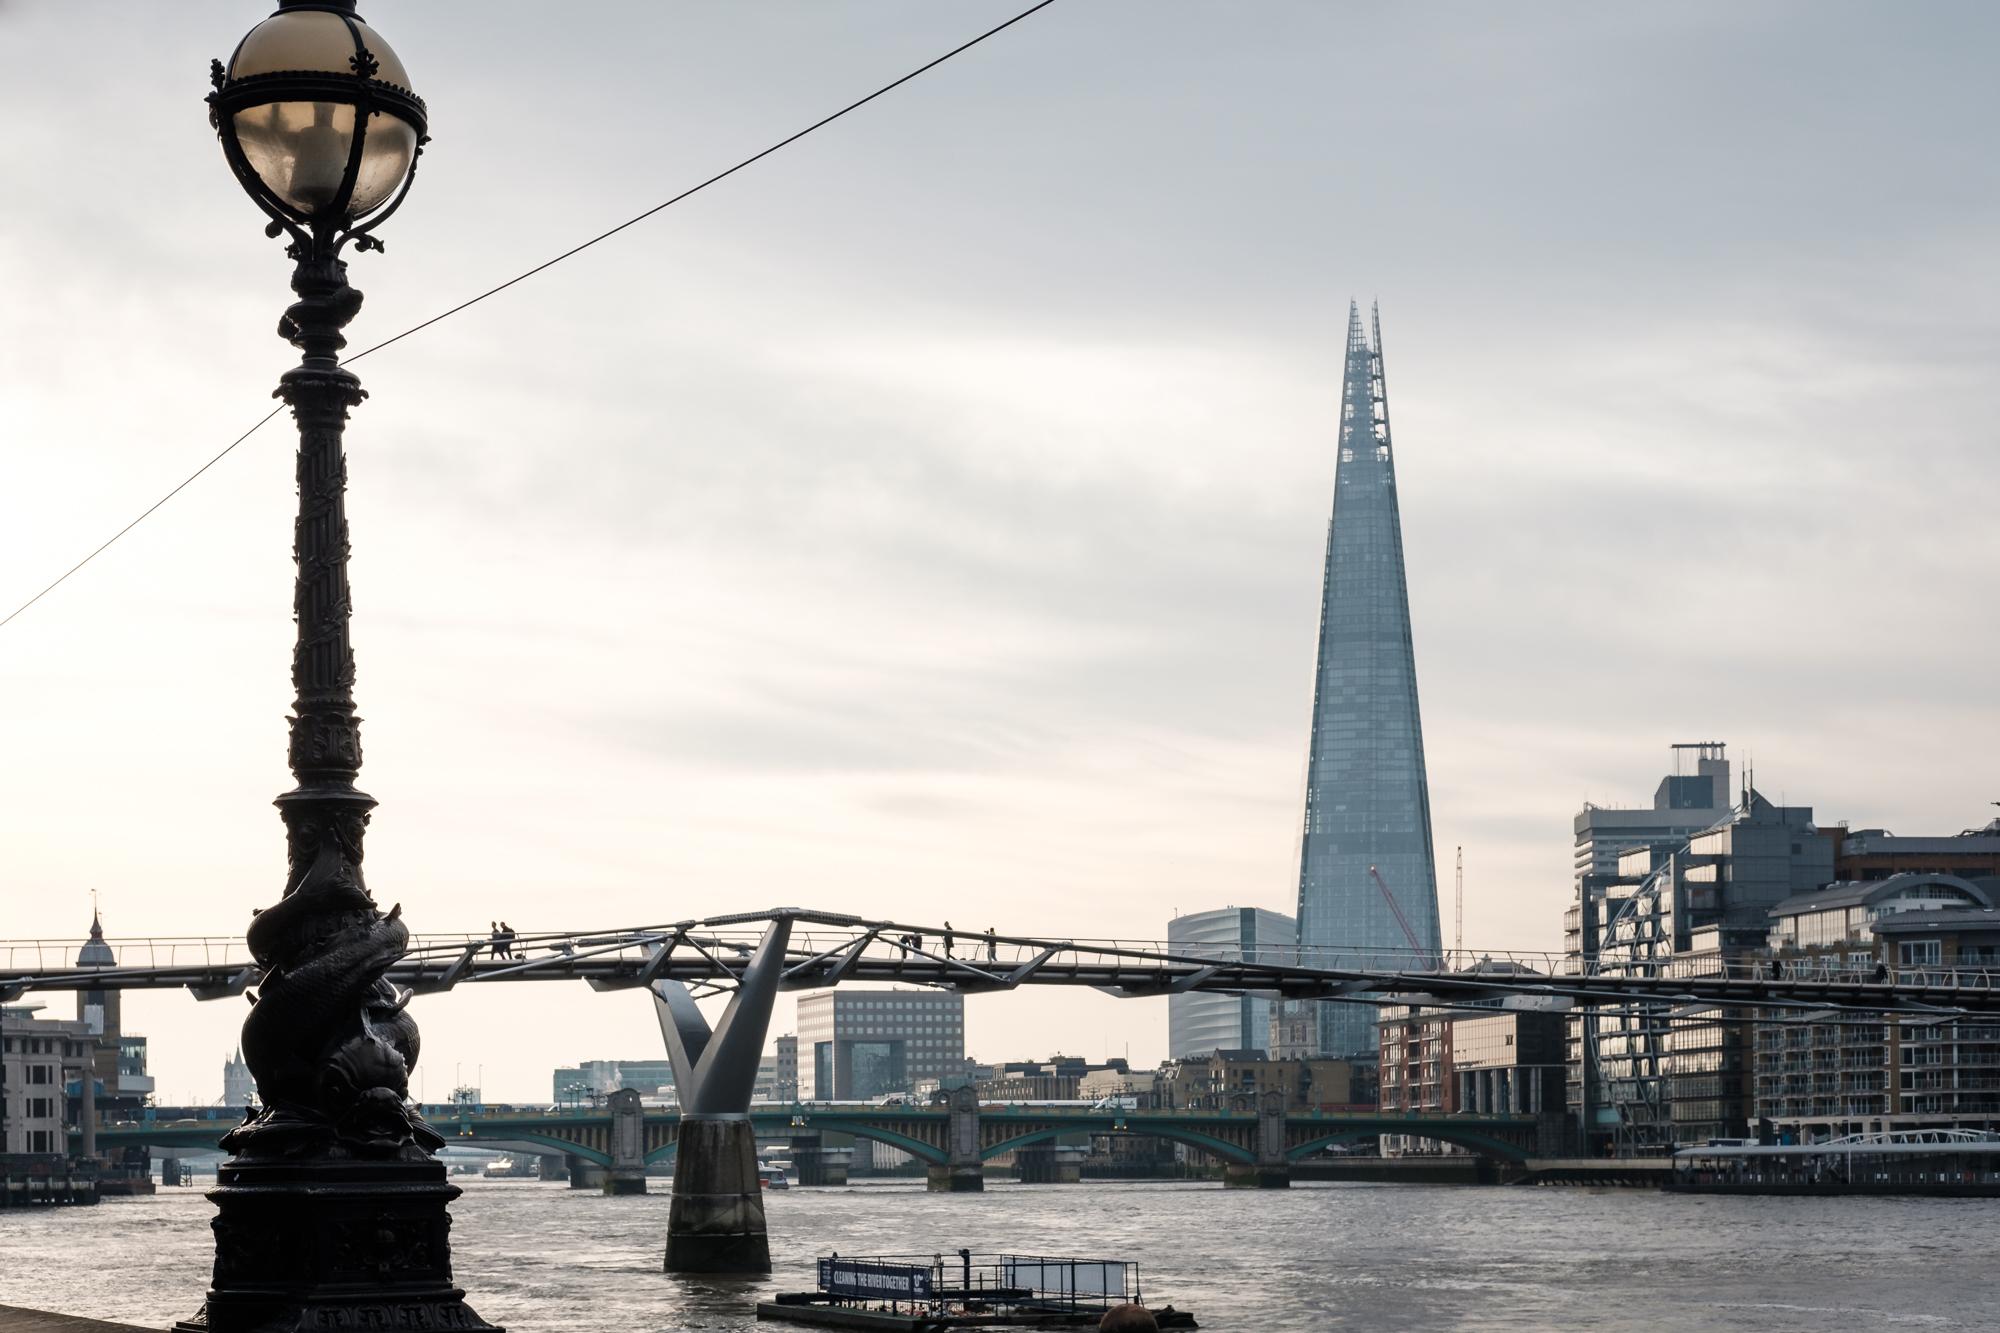 London Chrome photo under the Millennium Bridge by Trevor Sherwin